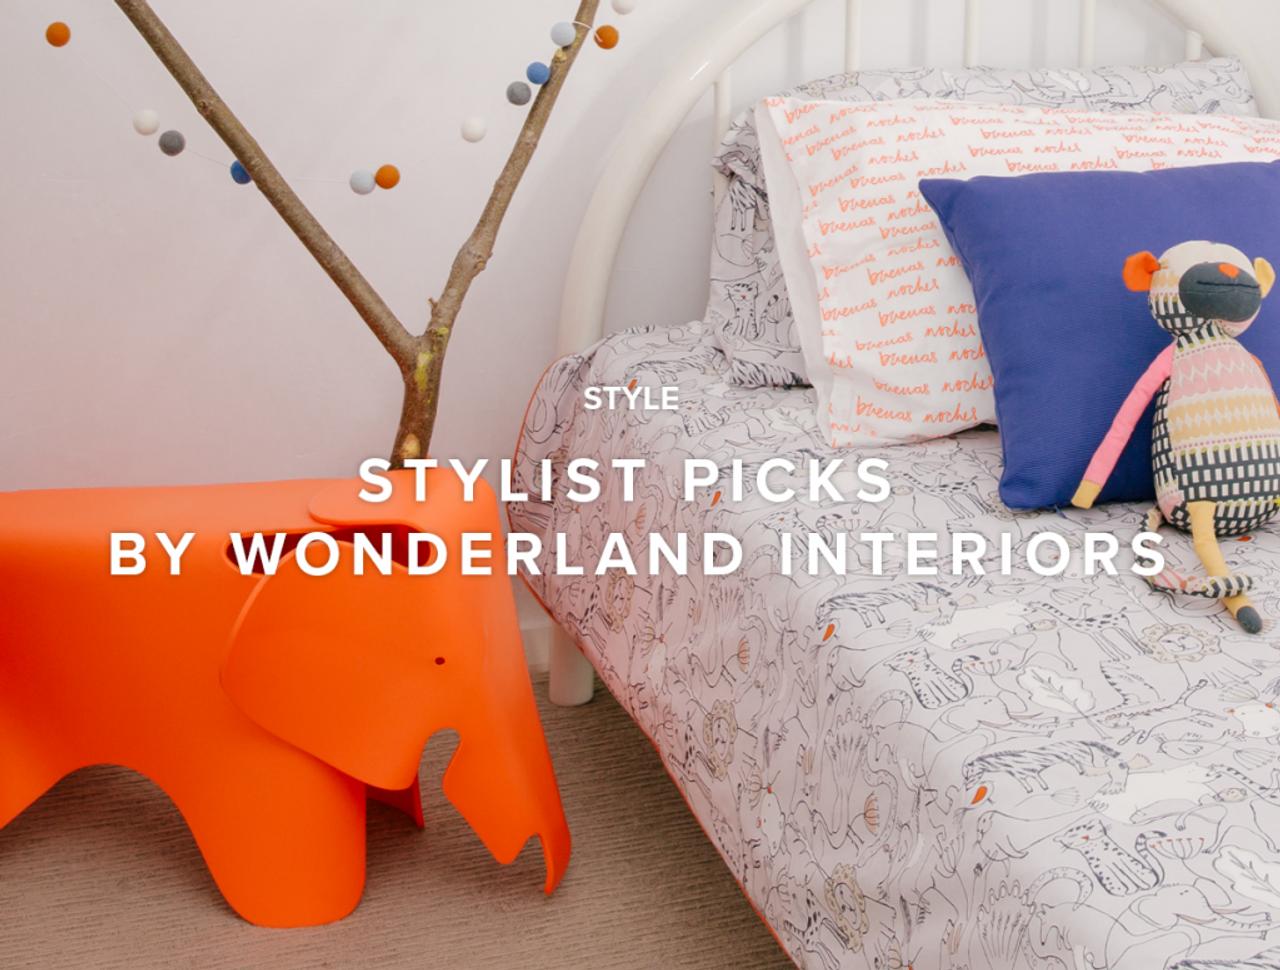 Stylist Picks by Wonderland Interiors